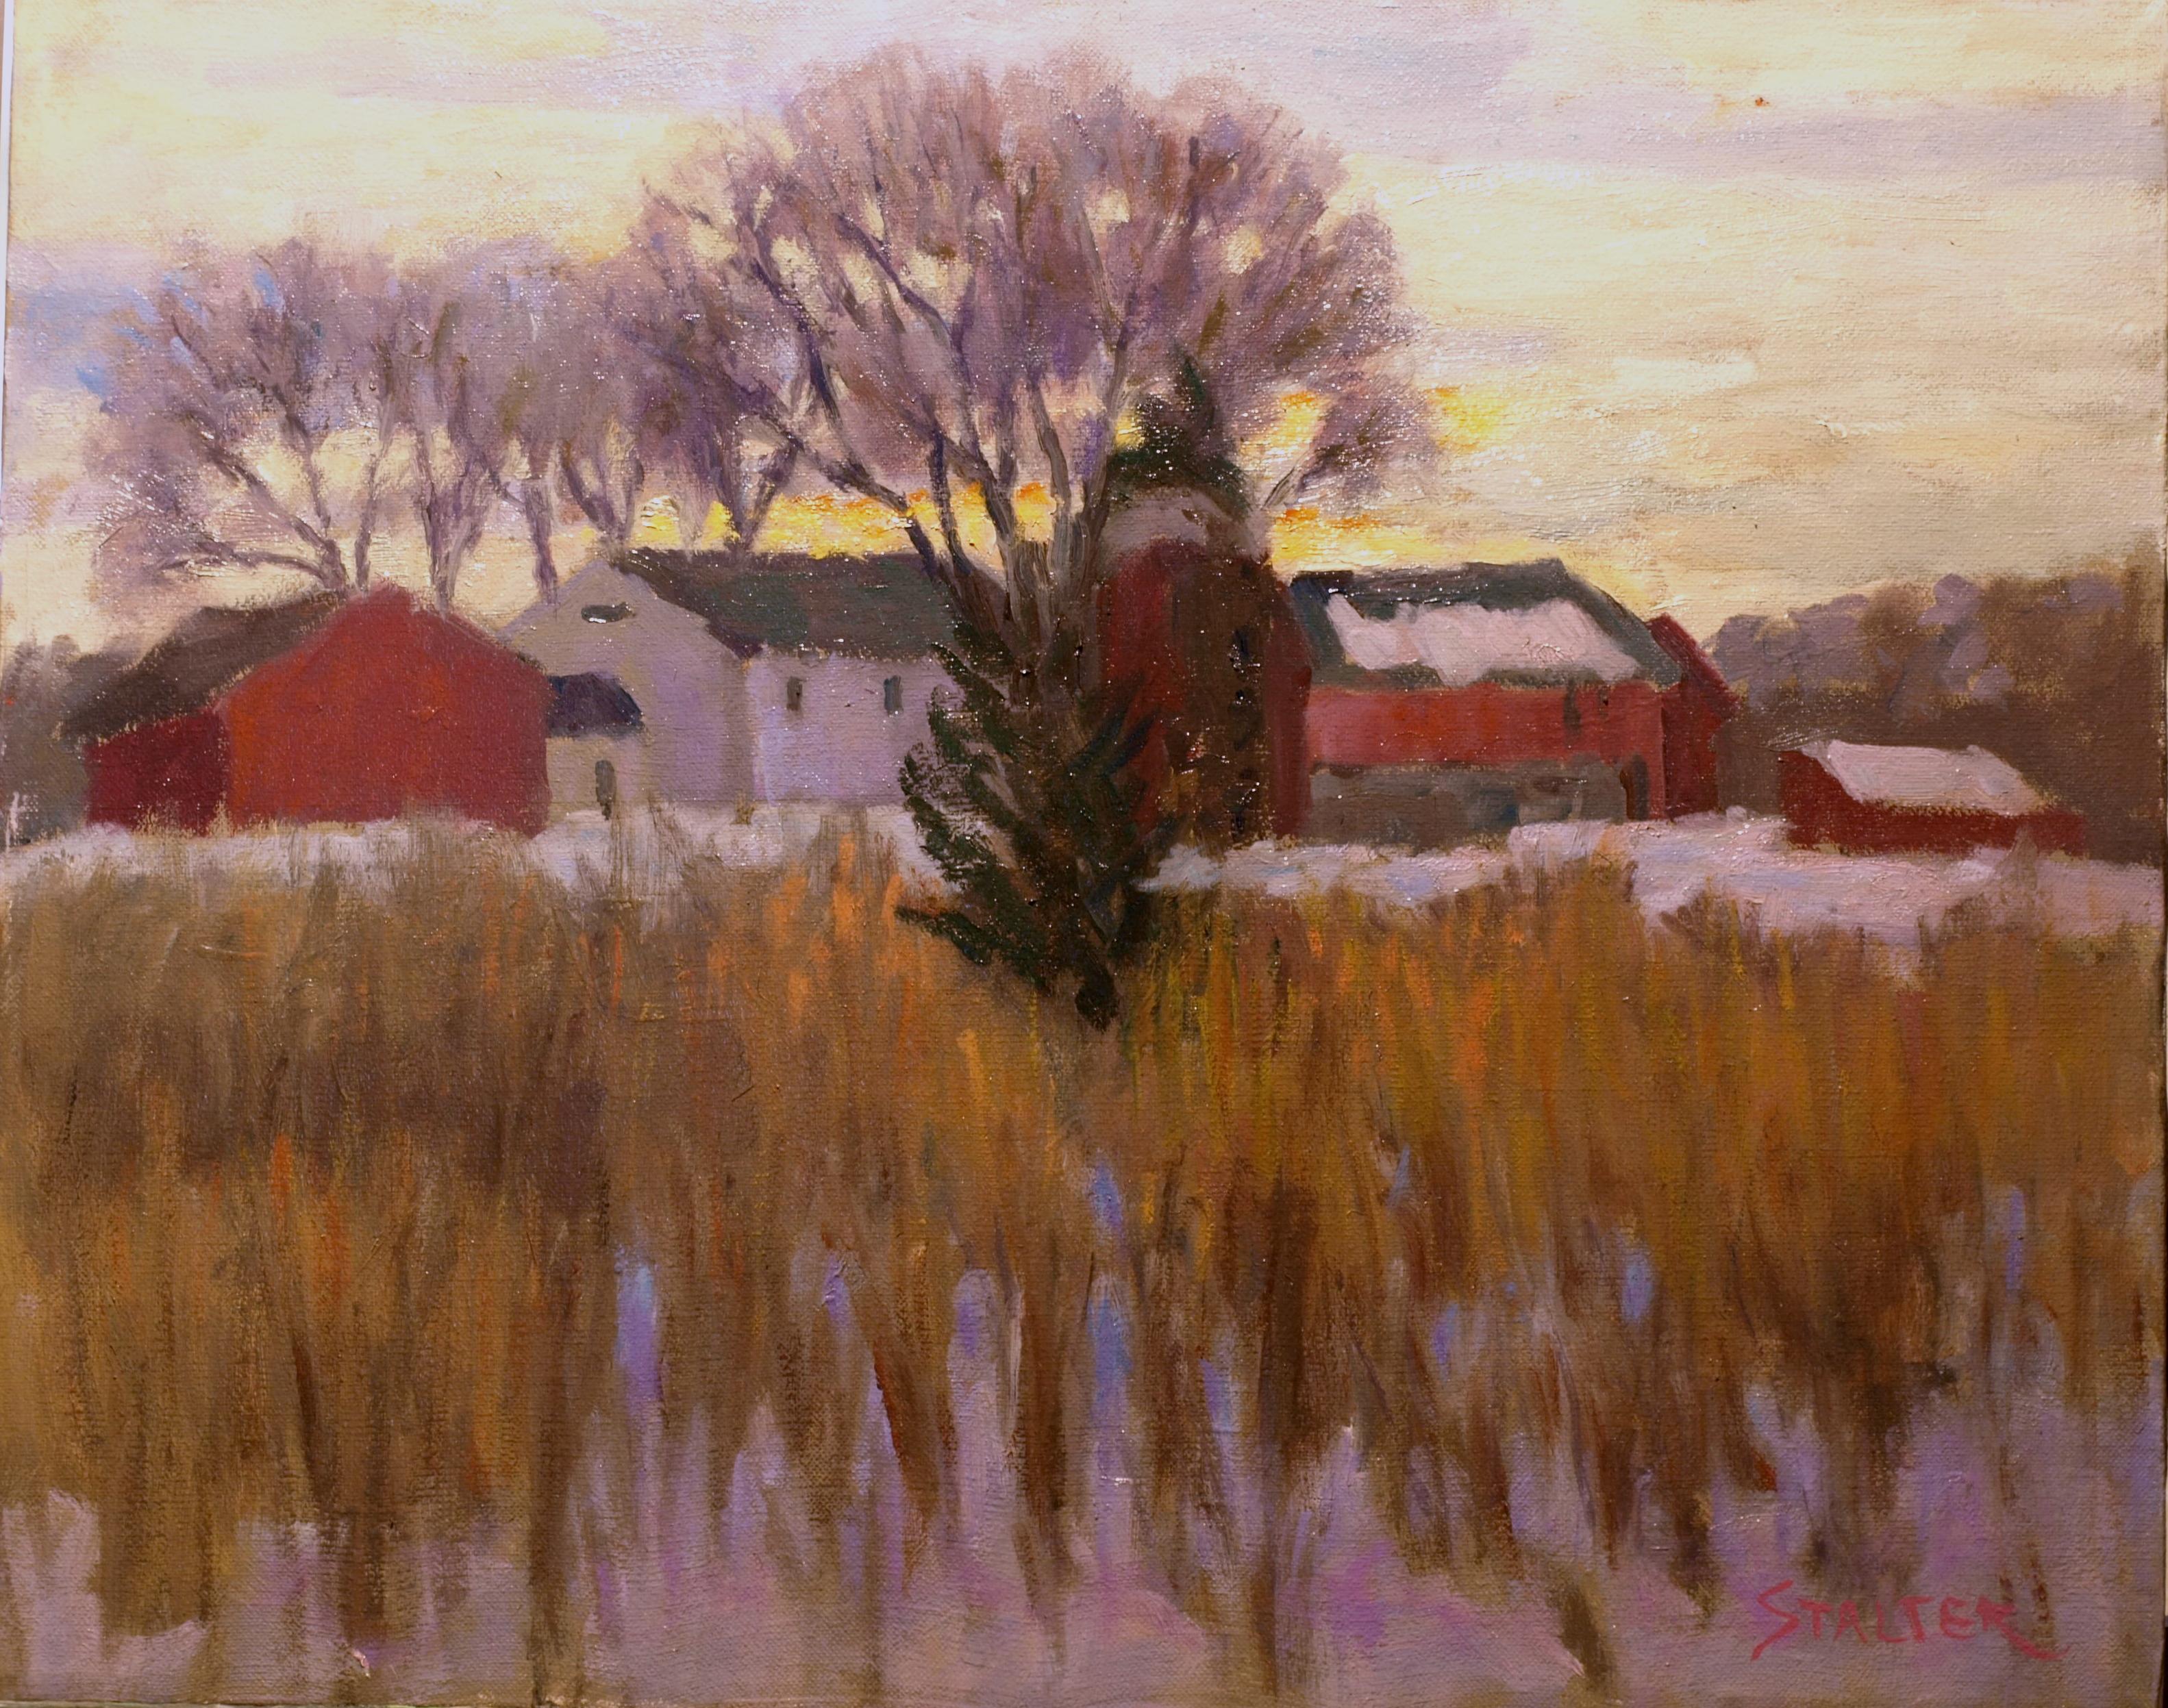 Snowy Day - Osborn Farm, Oil on Canvas, 16 x 20 Inches, by Richard Stalter, $450